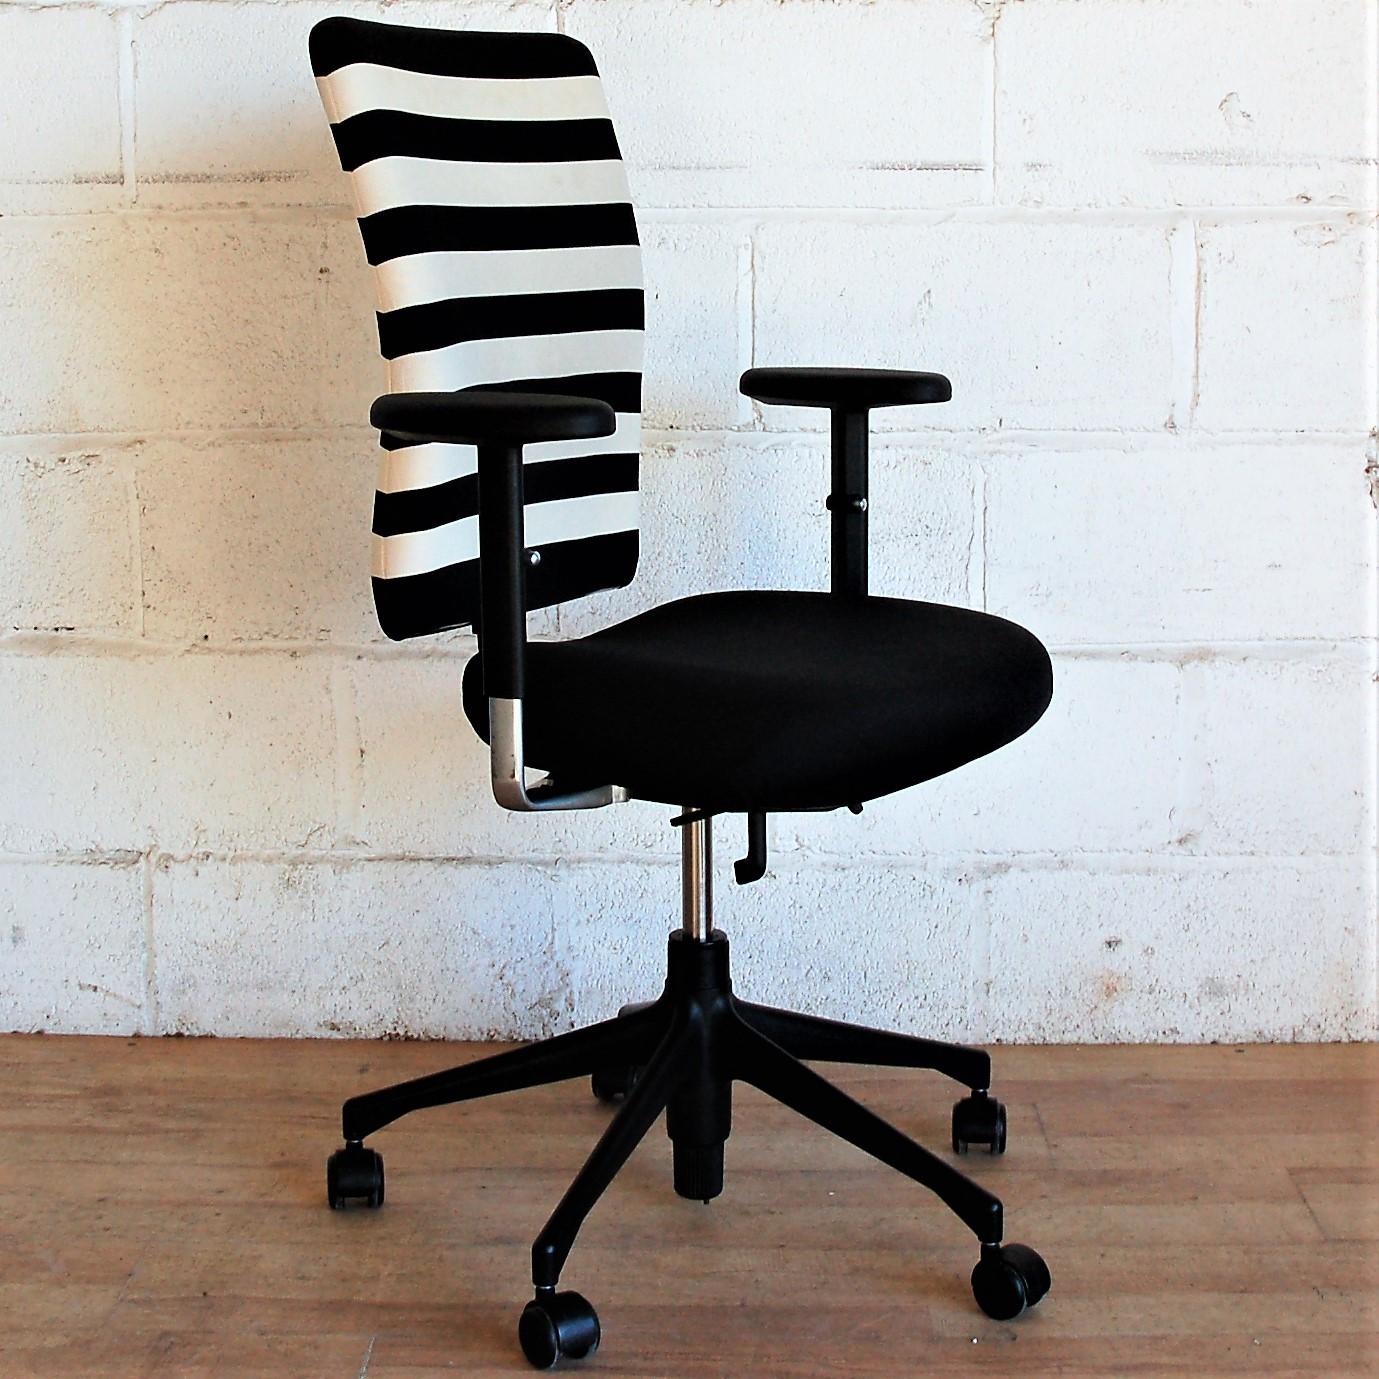 VITRA 'T' Task Chair Black White Stripe 2128